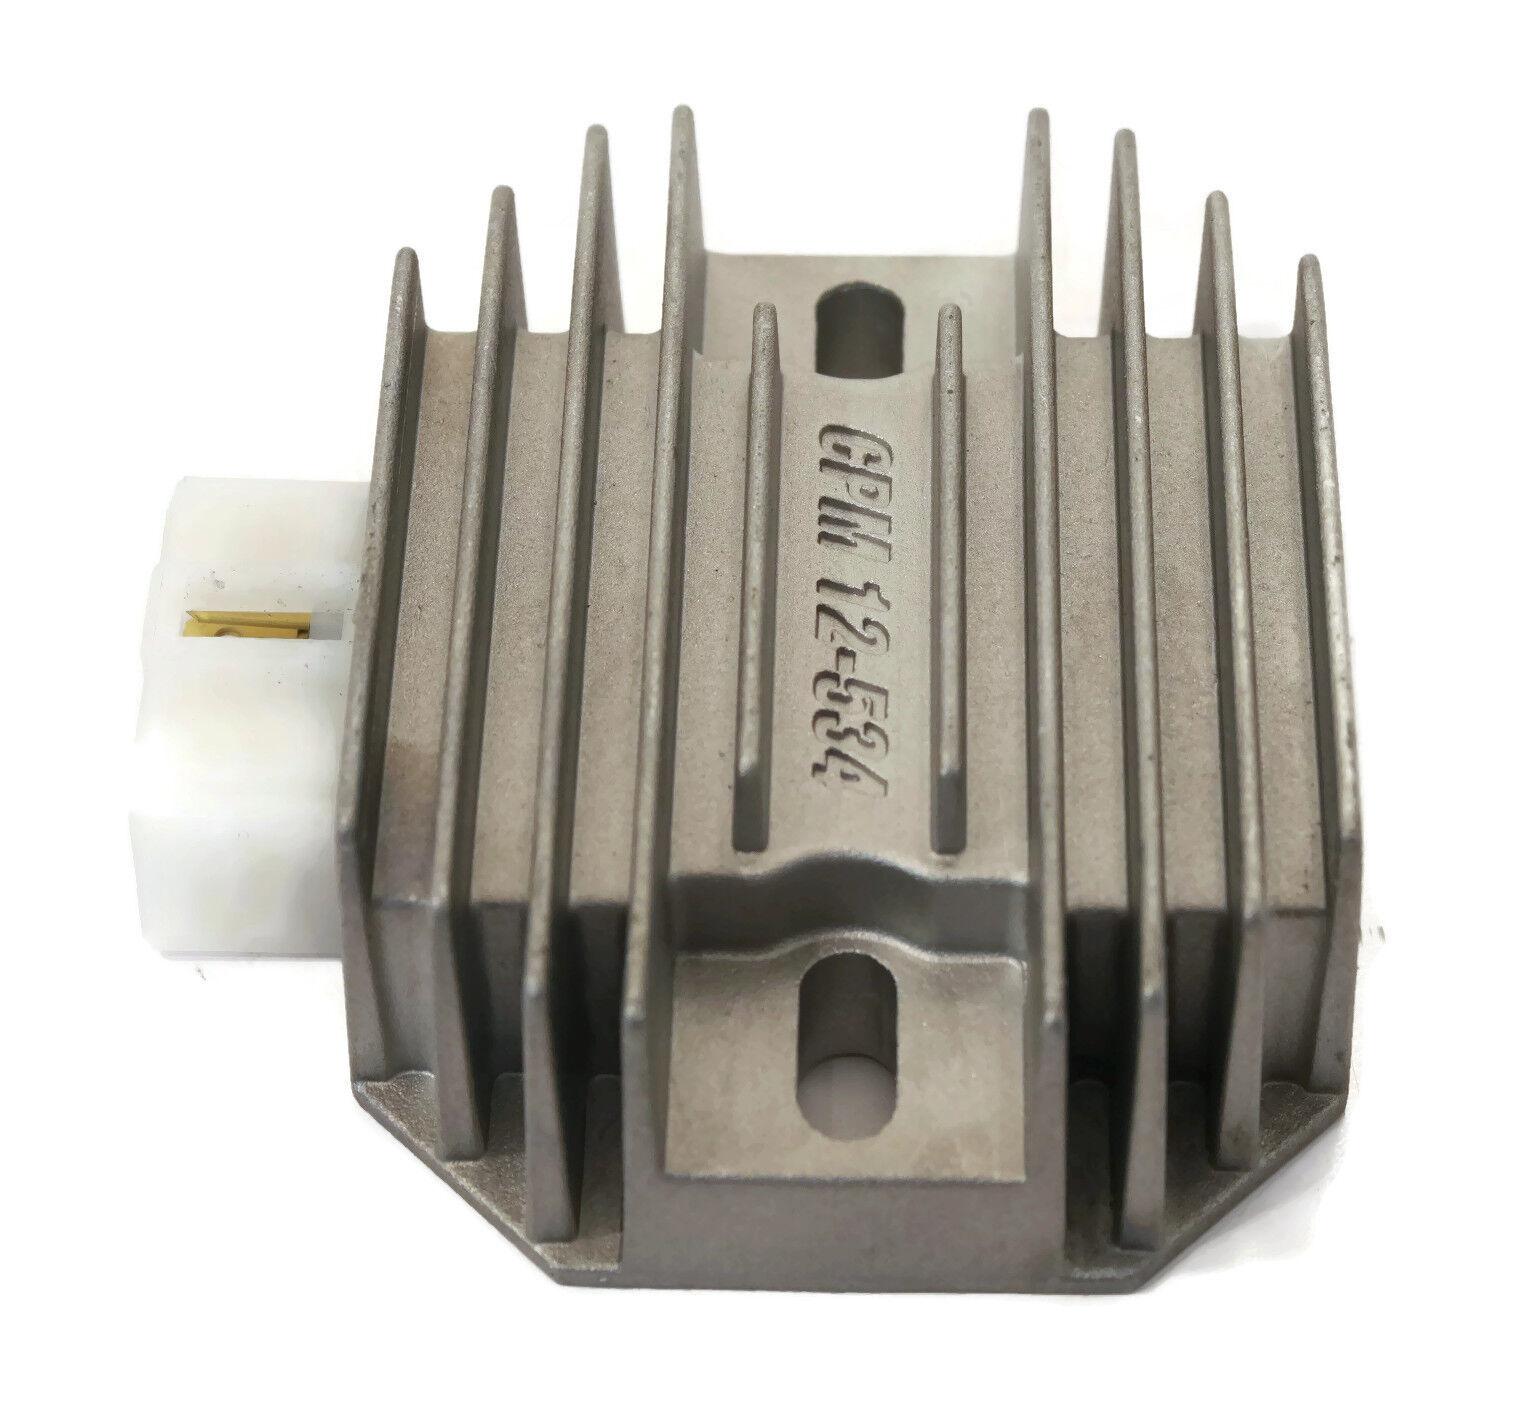 Voltage Regulator John Deere Lx277 Parts Diagram Trusted Wiring Lx279 Rectifier Fits Lx188 Lx289